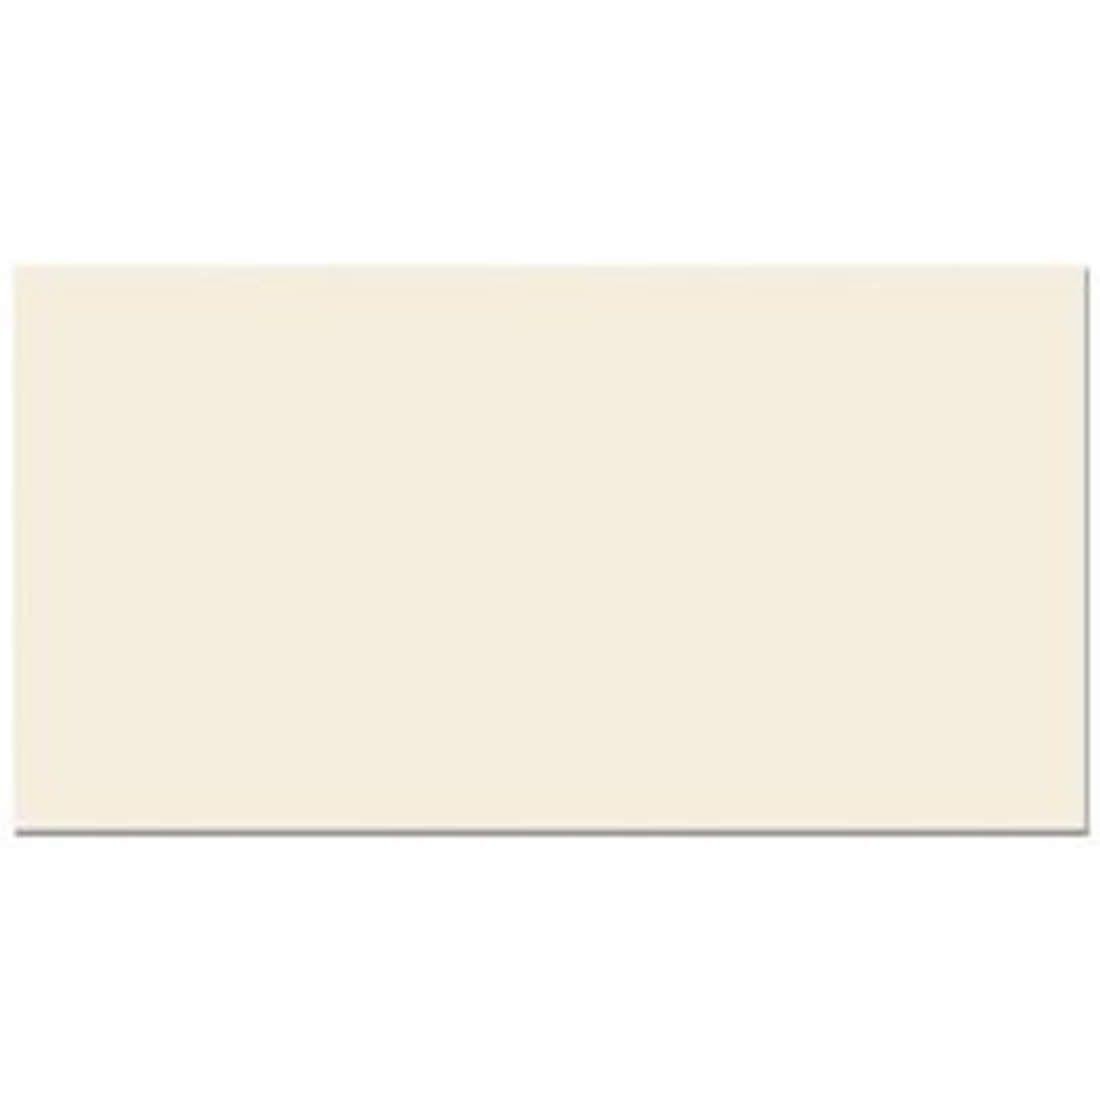 Revestimento Embramaco 33 x 57 Beige Absolut Ref: 52700